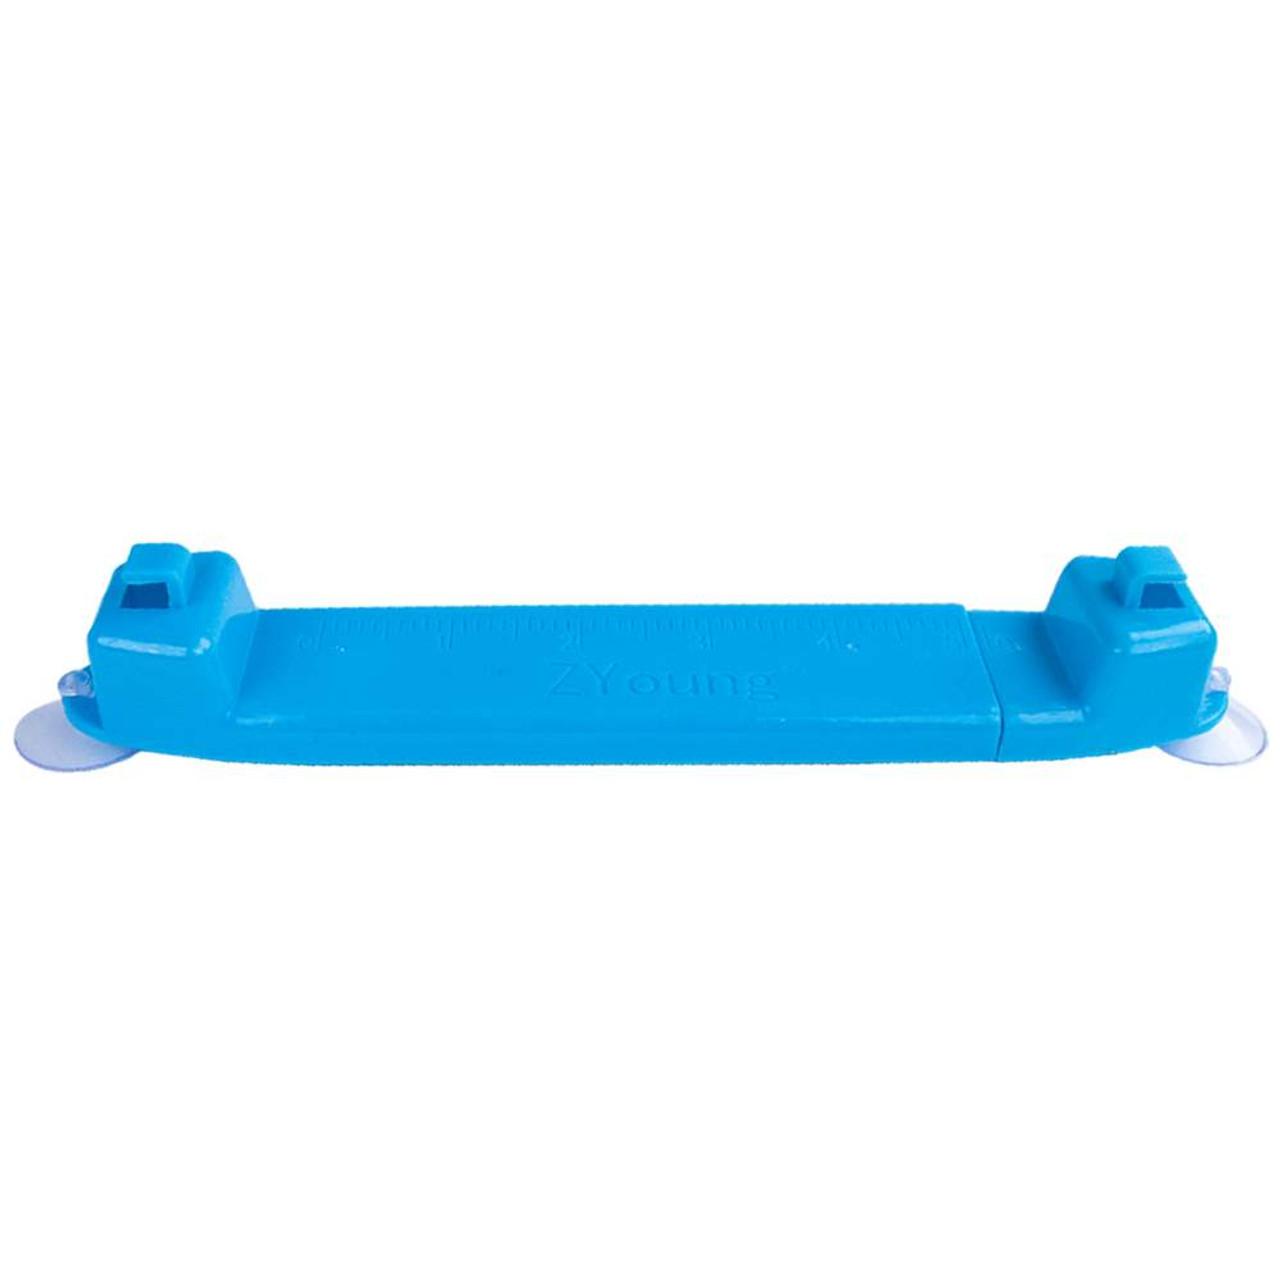 plastic paracord jig